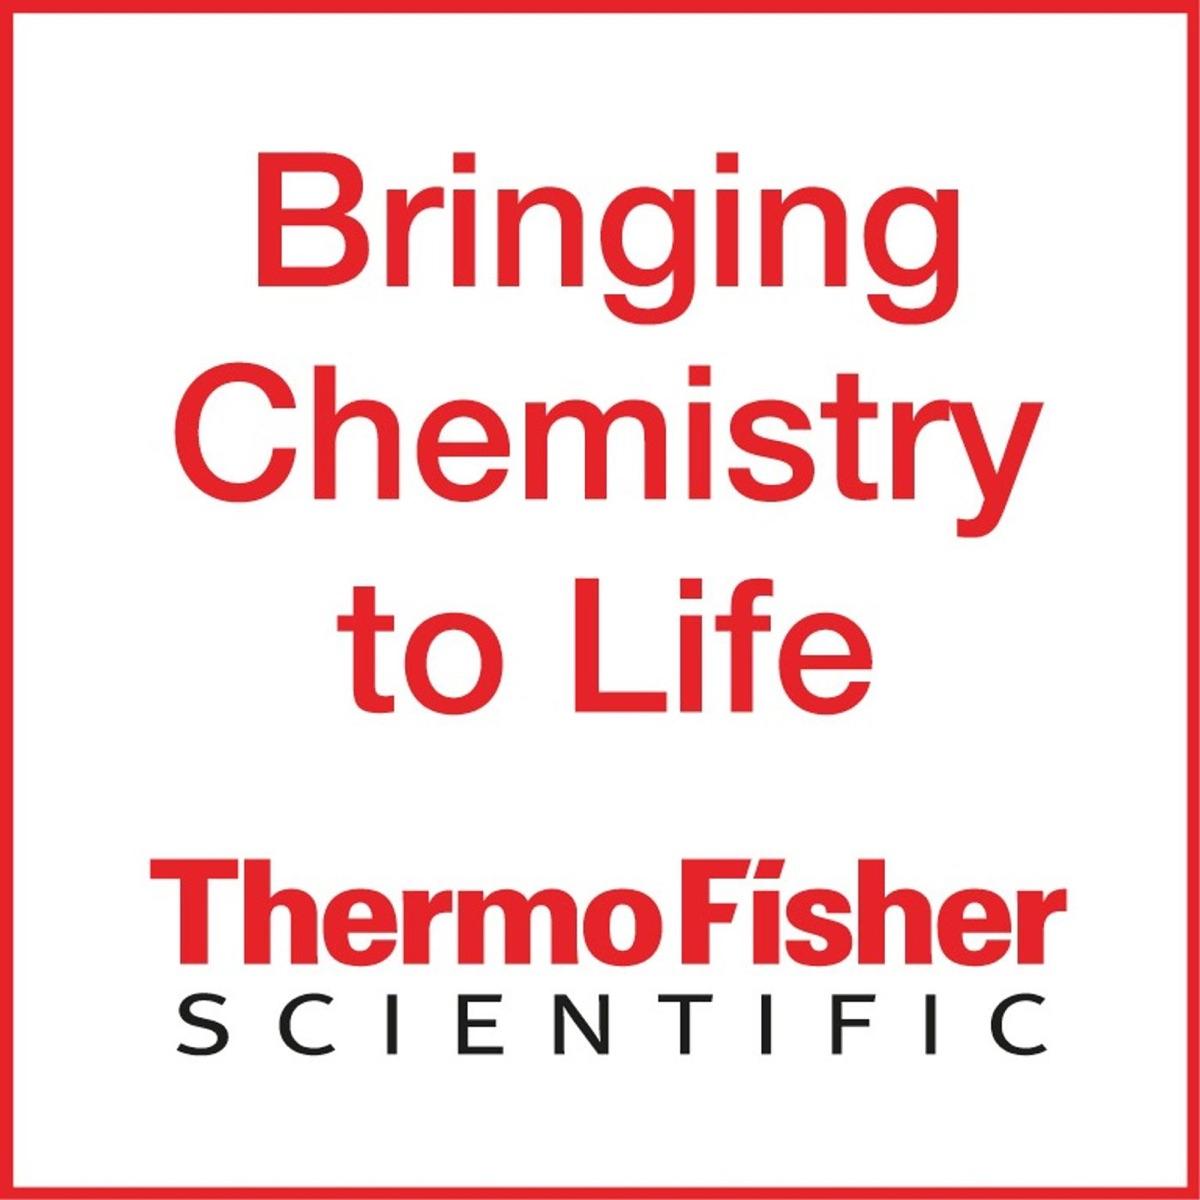 Bringing Chemistry to Life